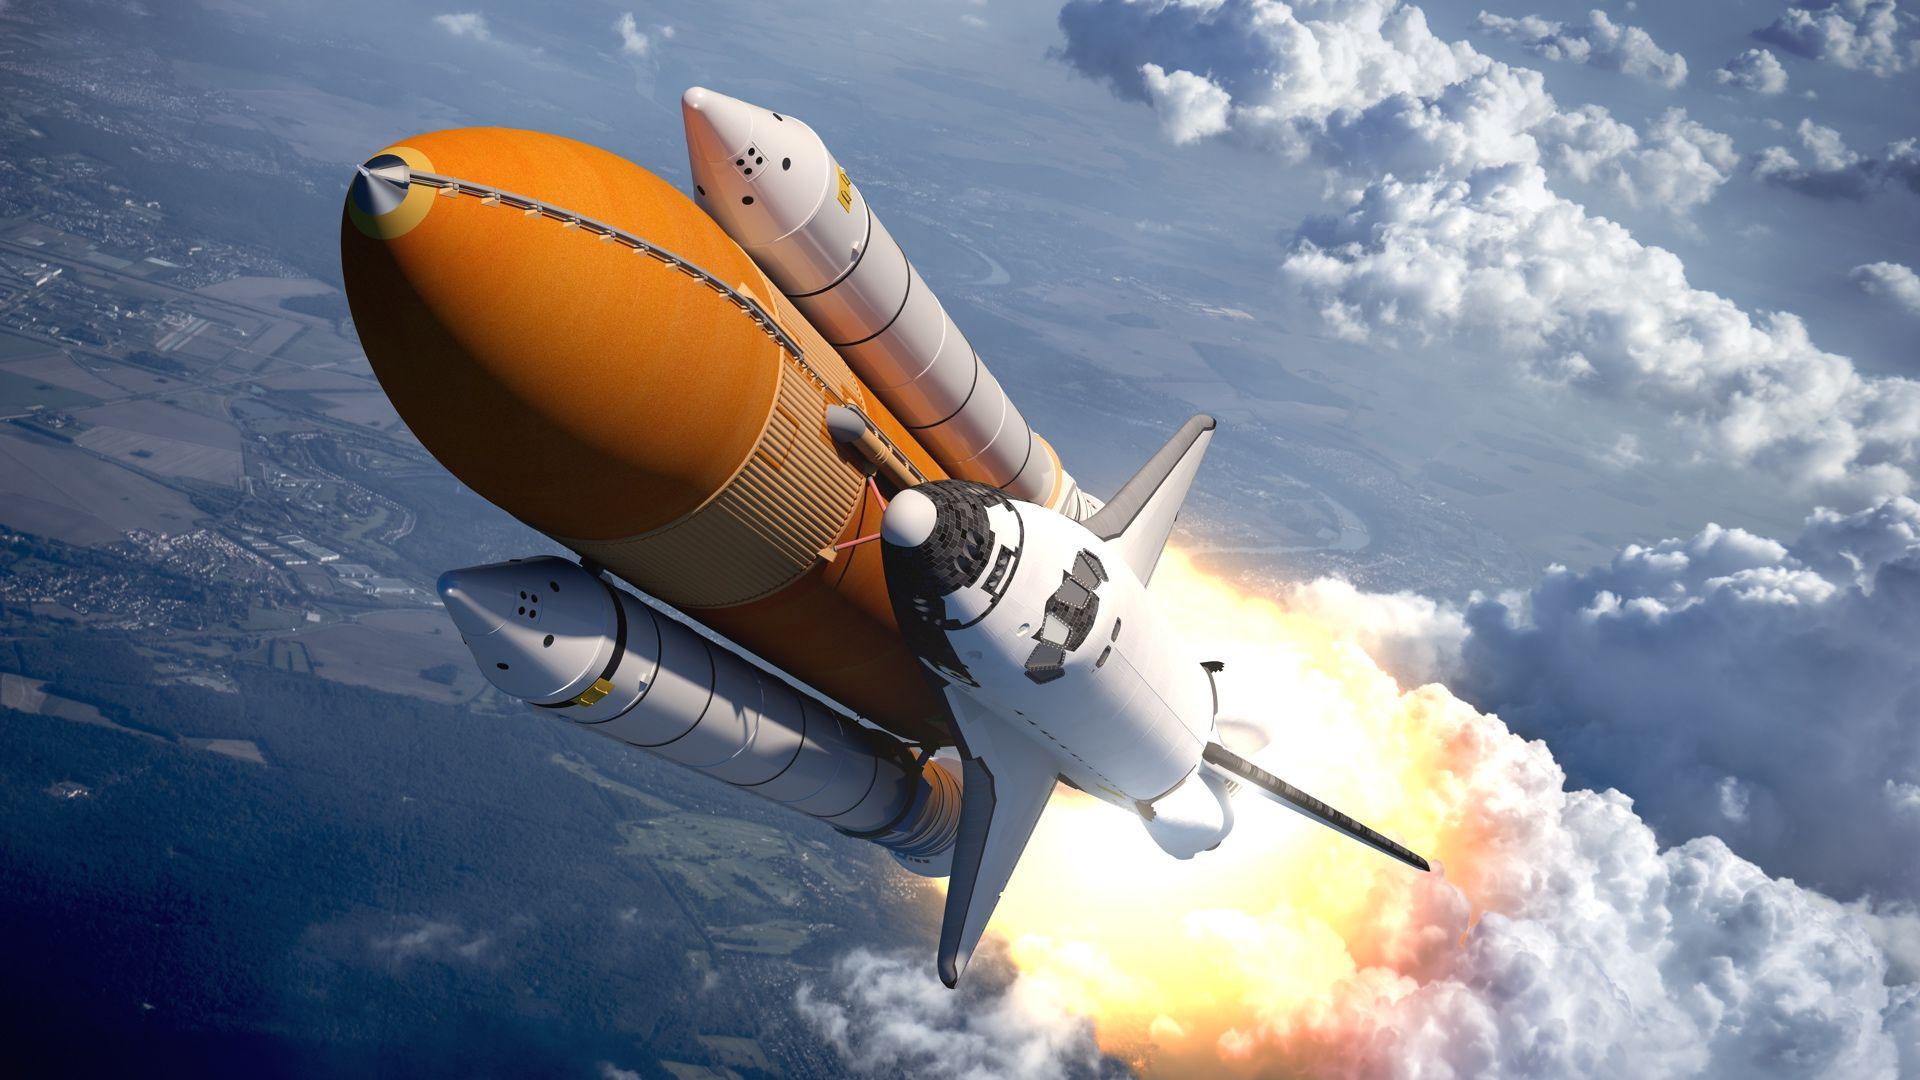 Rocket download free wallpaper image search